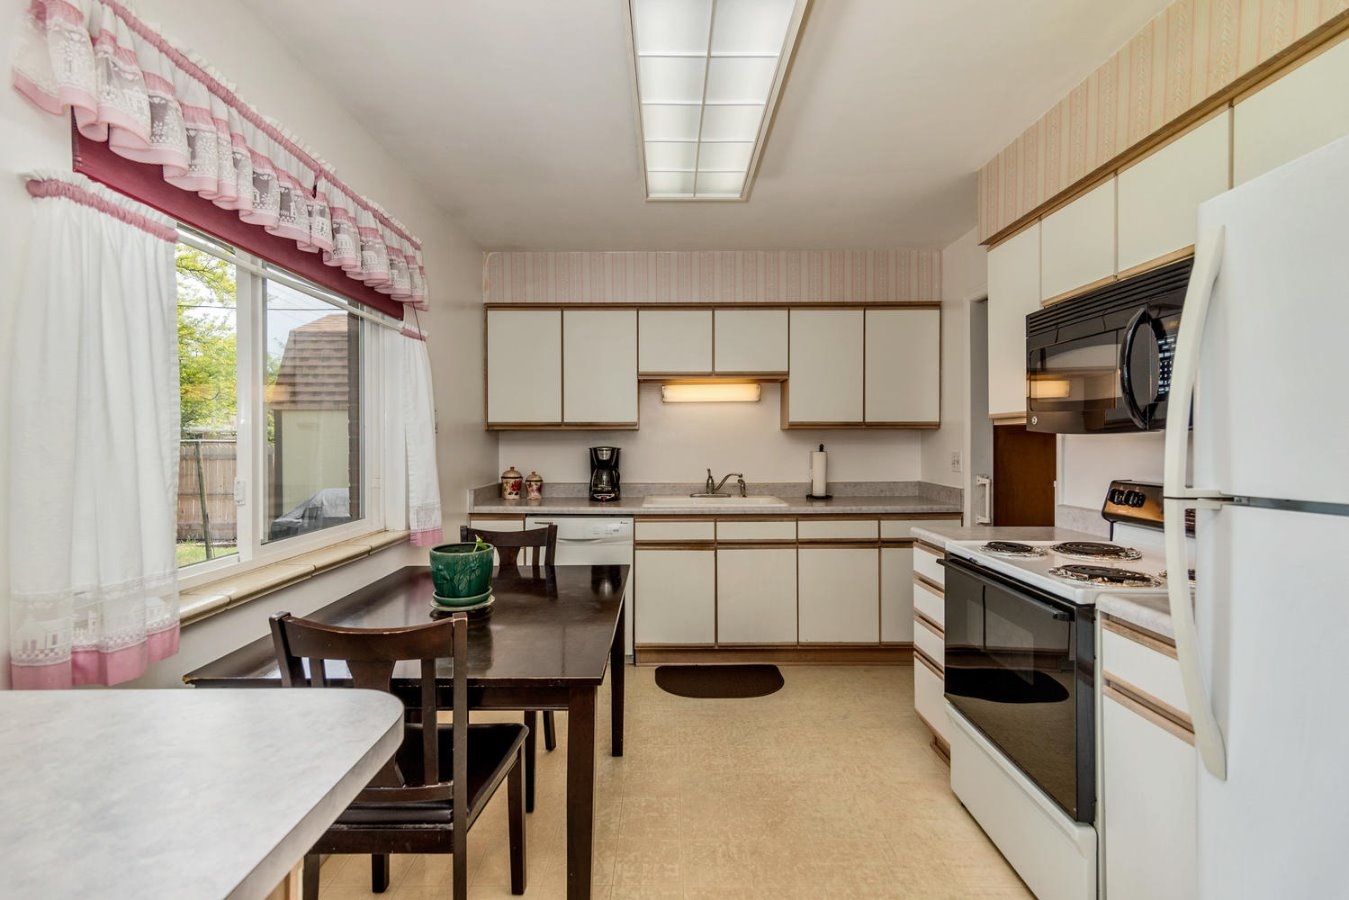 Great Workspaces in Bright Open Kitchen